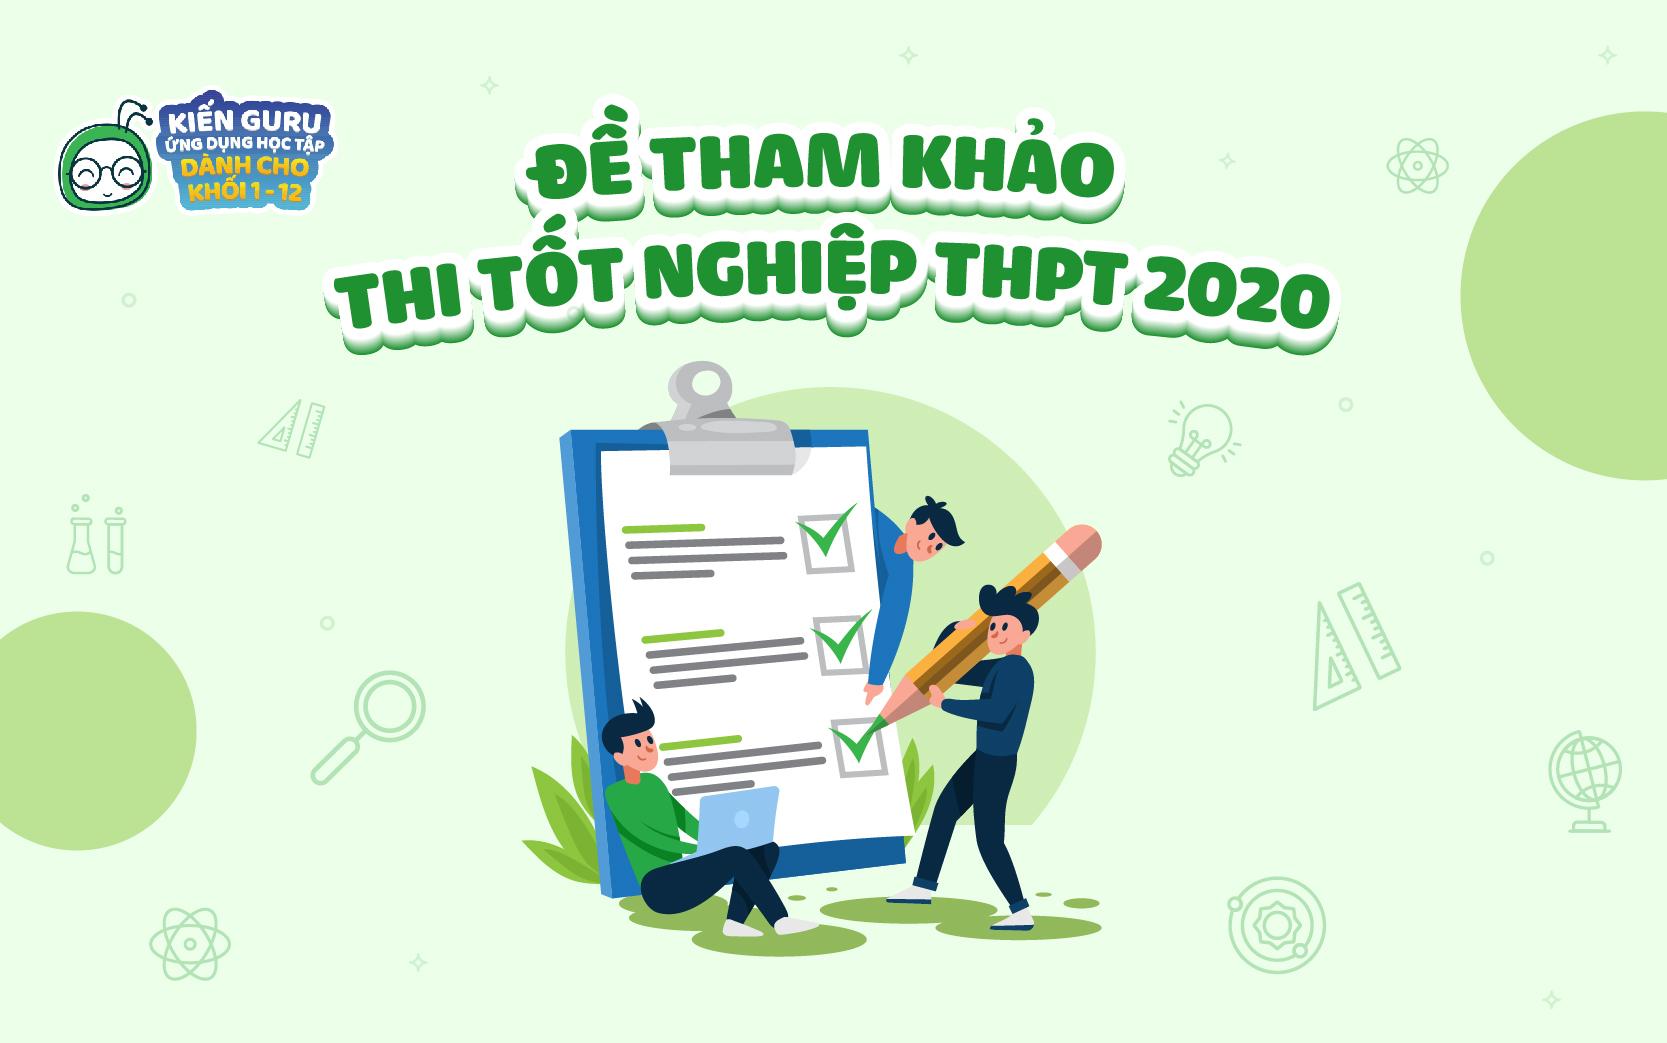 de-tham-khao-thi-tn-thpt-2020